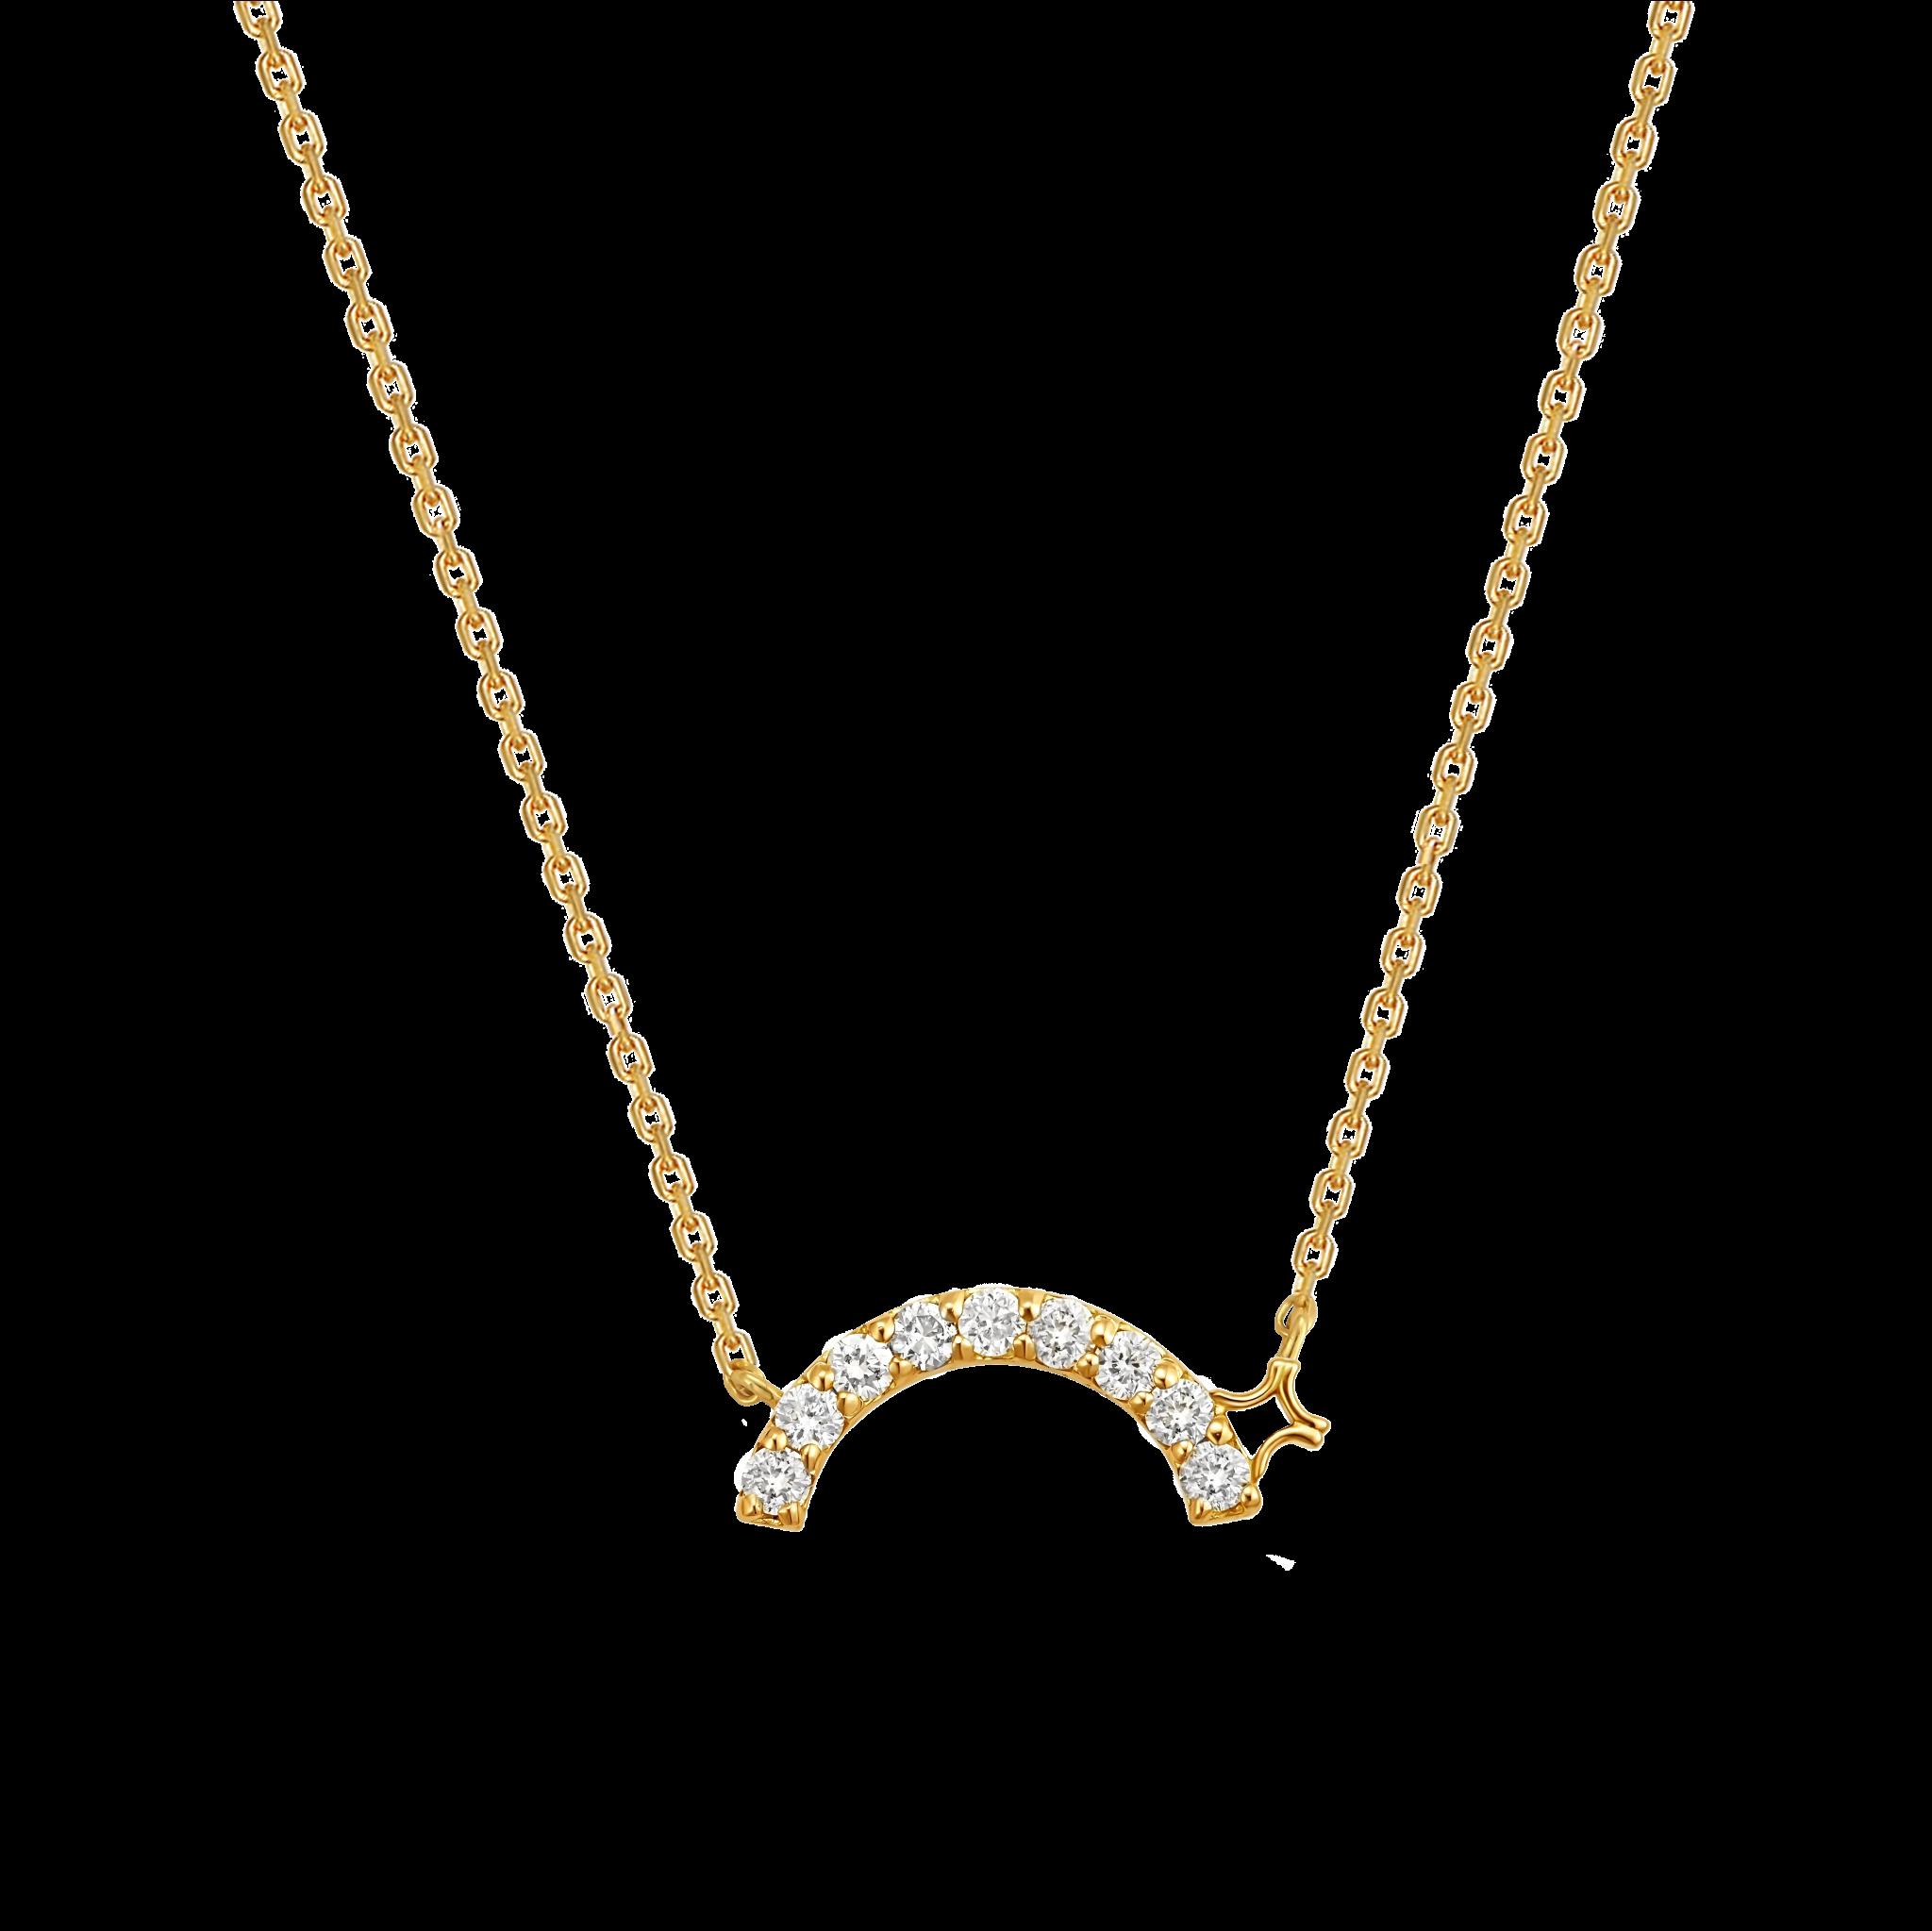 Beyond the Arc Collection 18K黄金 钻石项链-公主版 5699